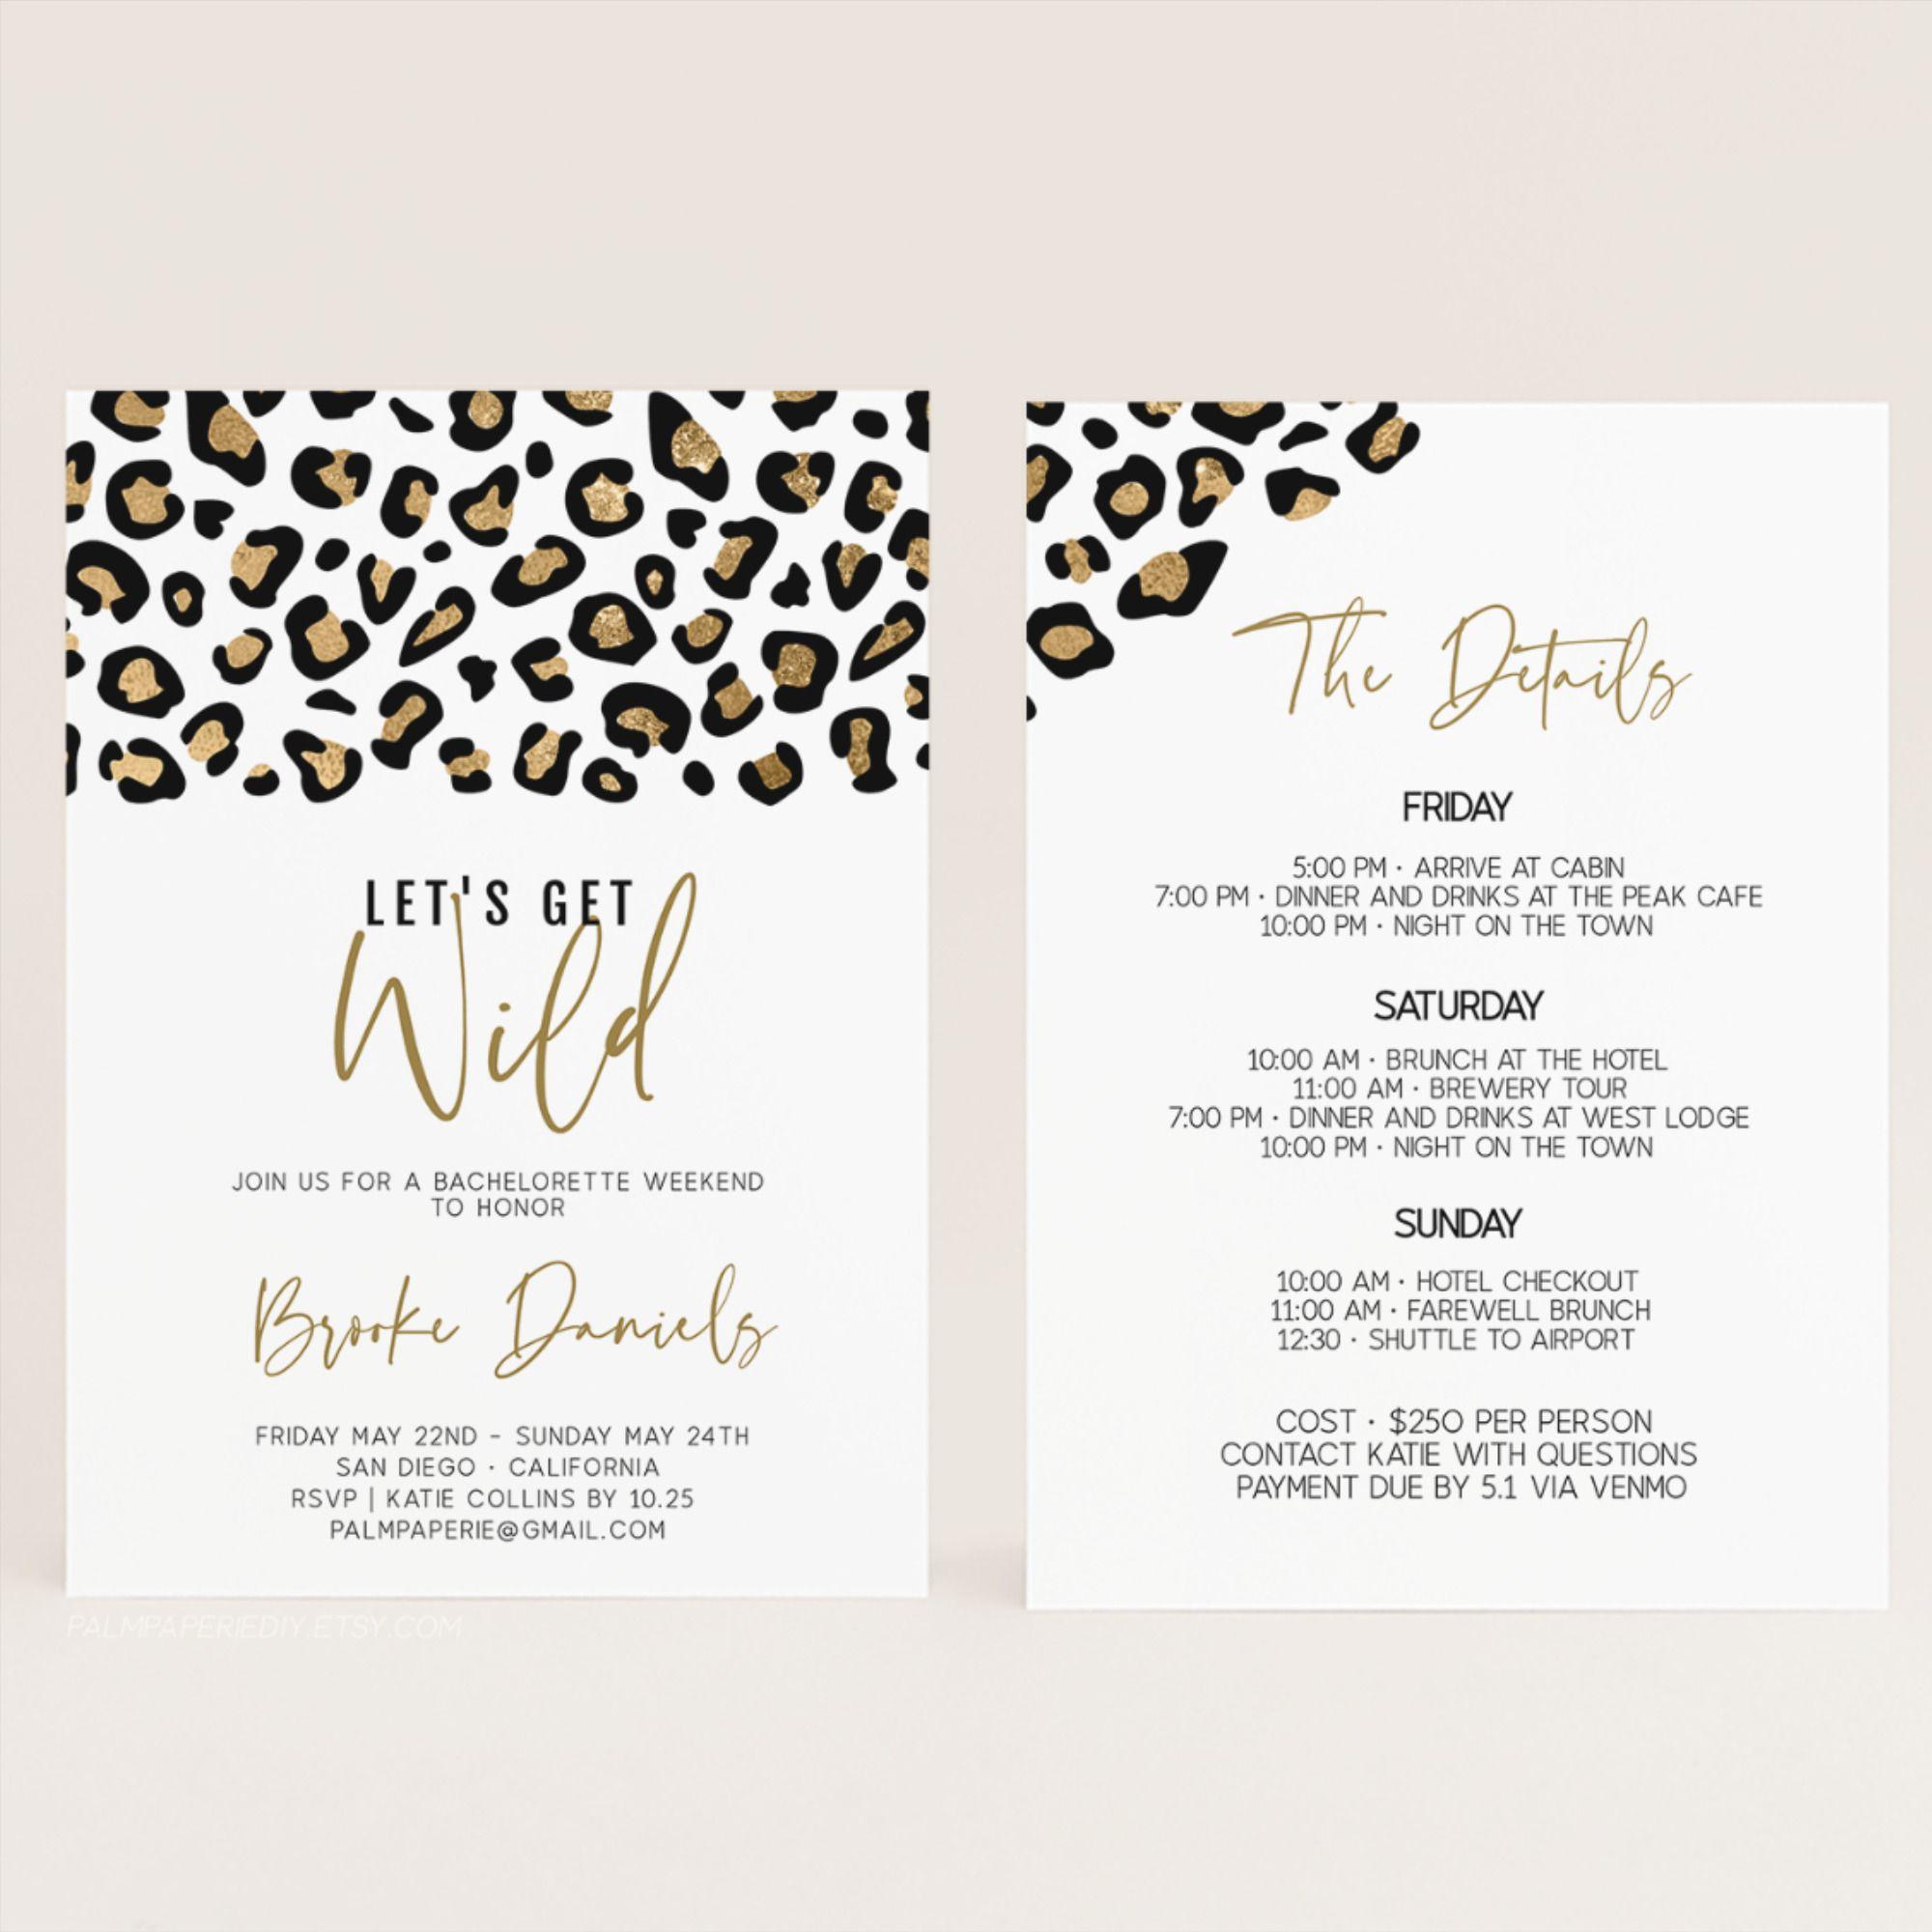 Animal Print Bachelorette Party Invitation With Itinerary Etsy Bachelorette Party Itinerary Template Bachelorette Party Itinerary Wild Bachelorette Party